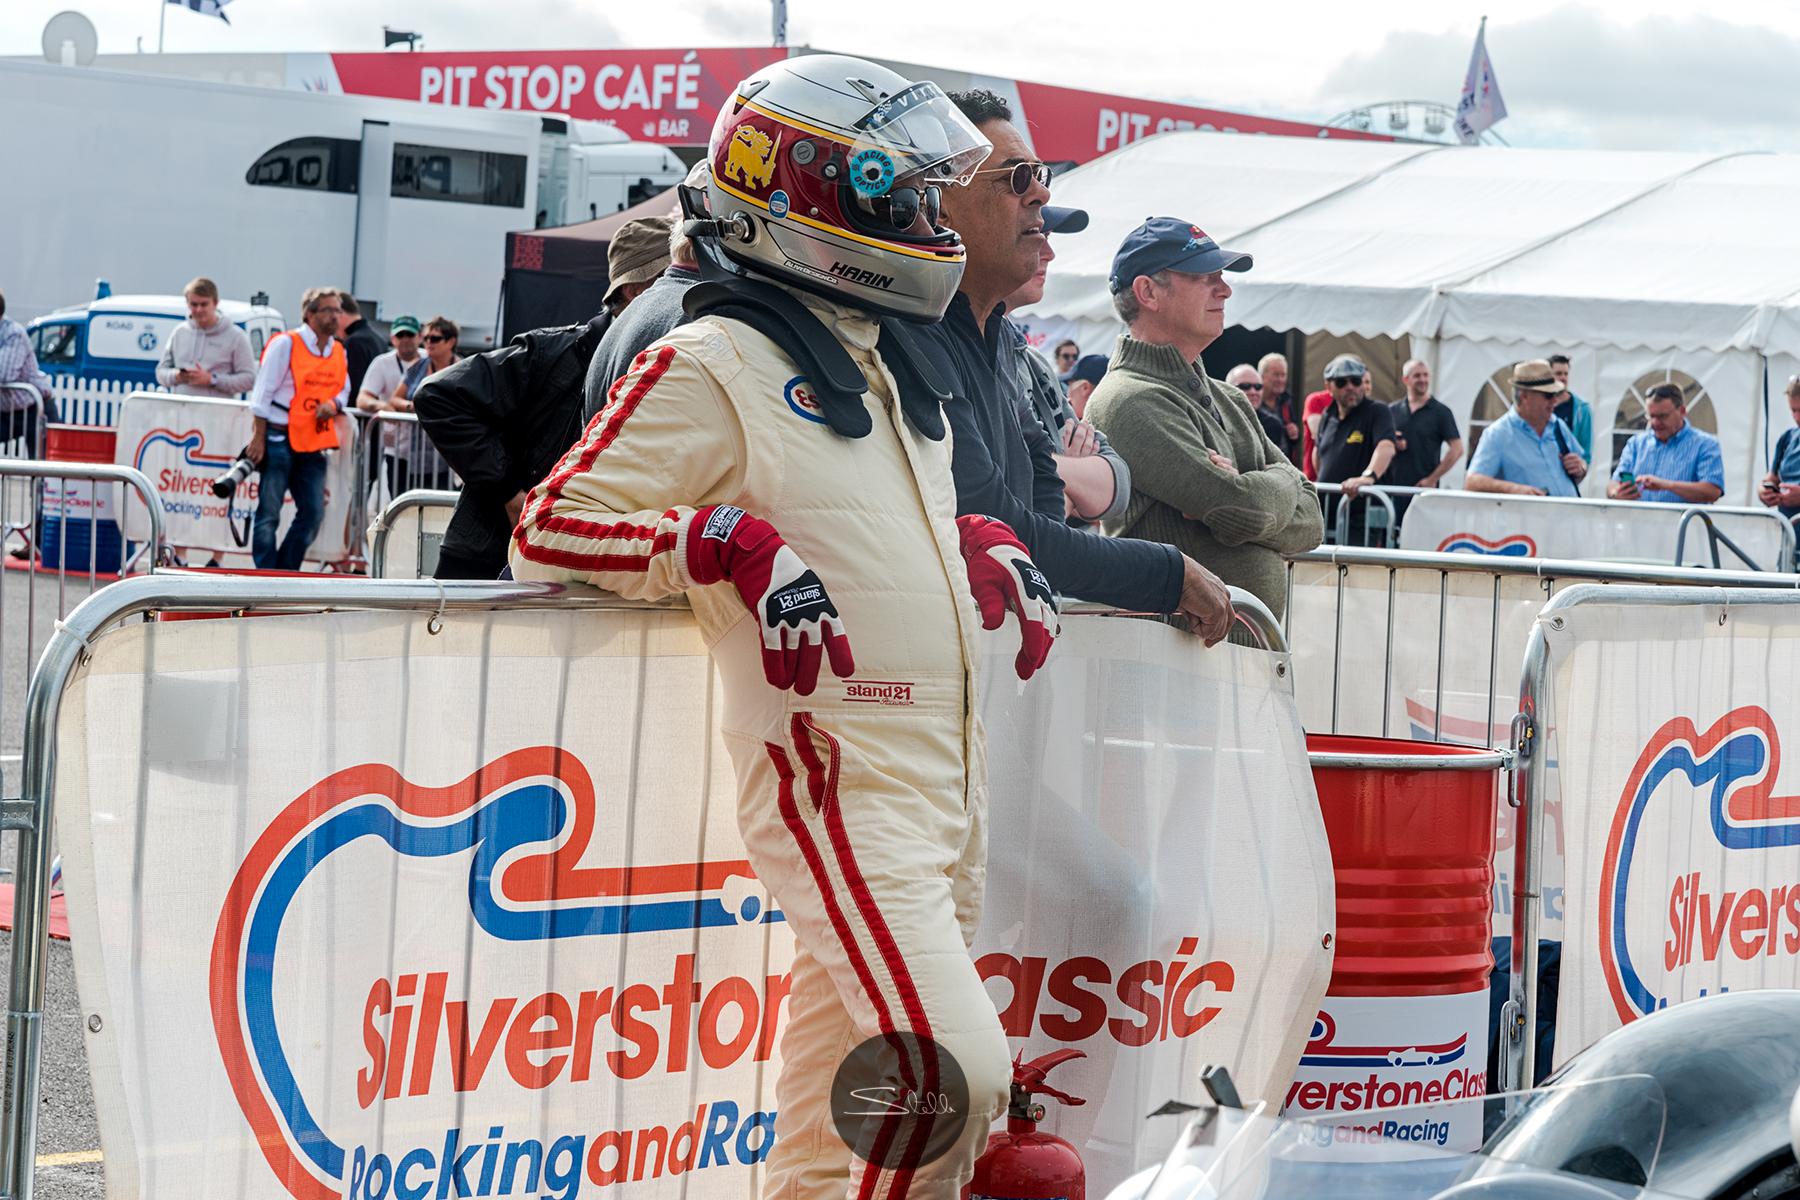 Stella Scordellis Silverstone Classic 2016 5 Watermarked.jpg